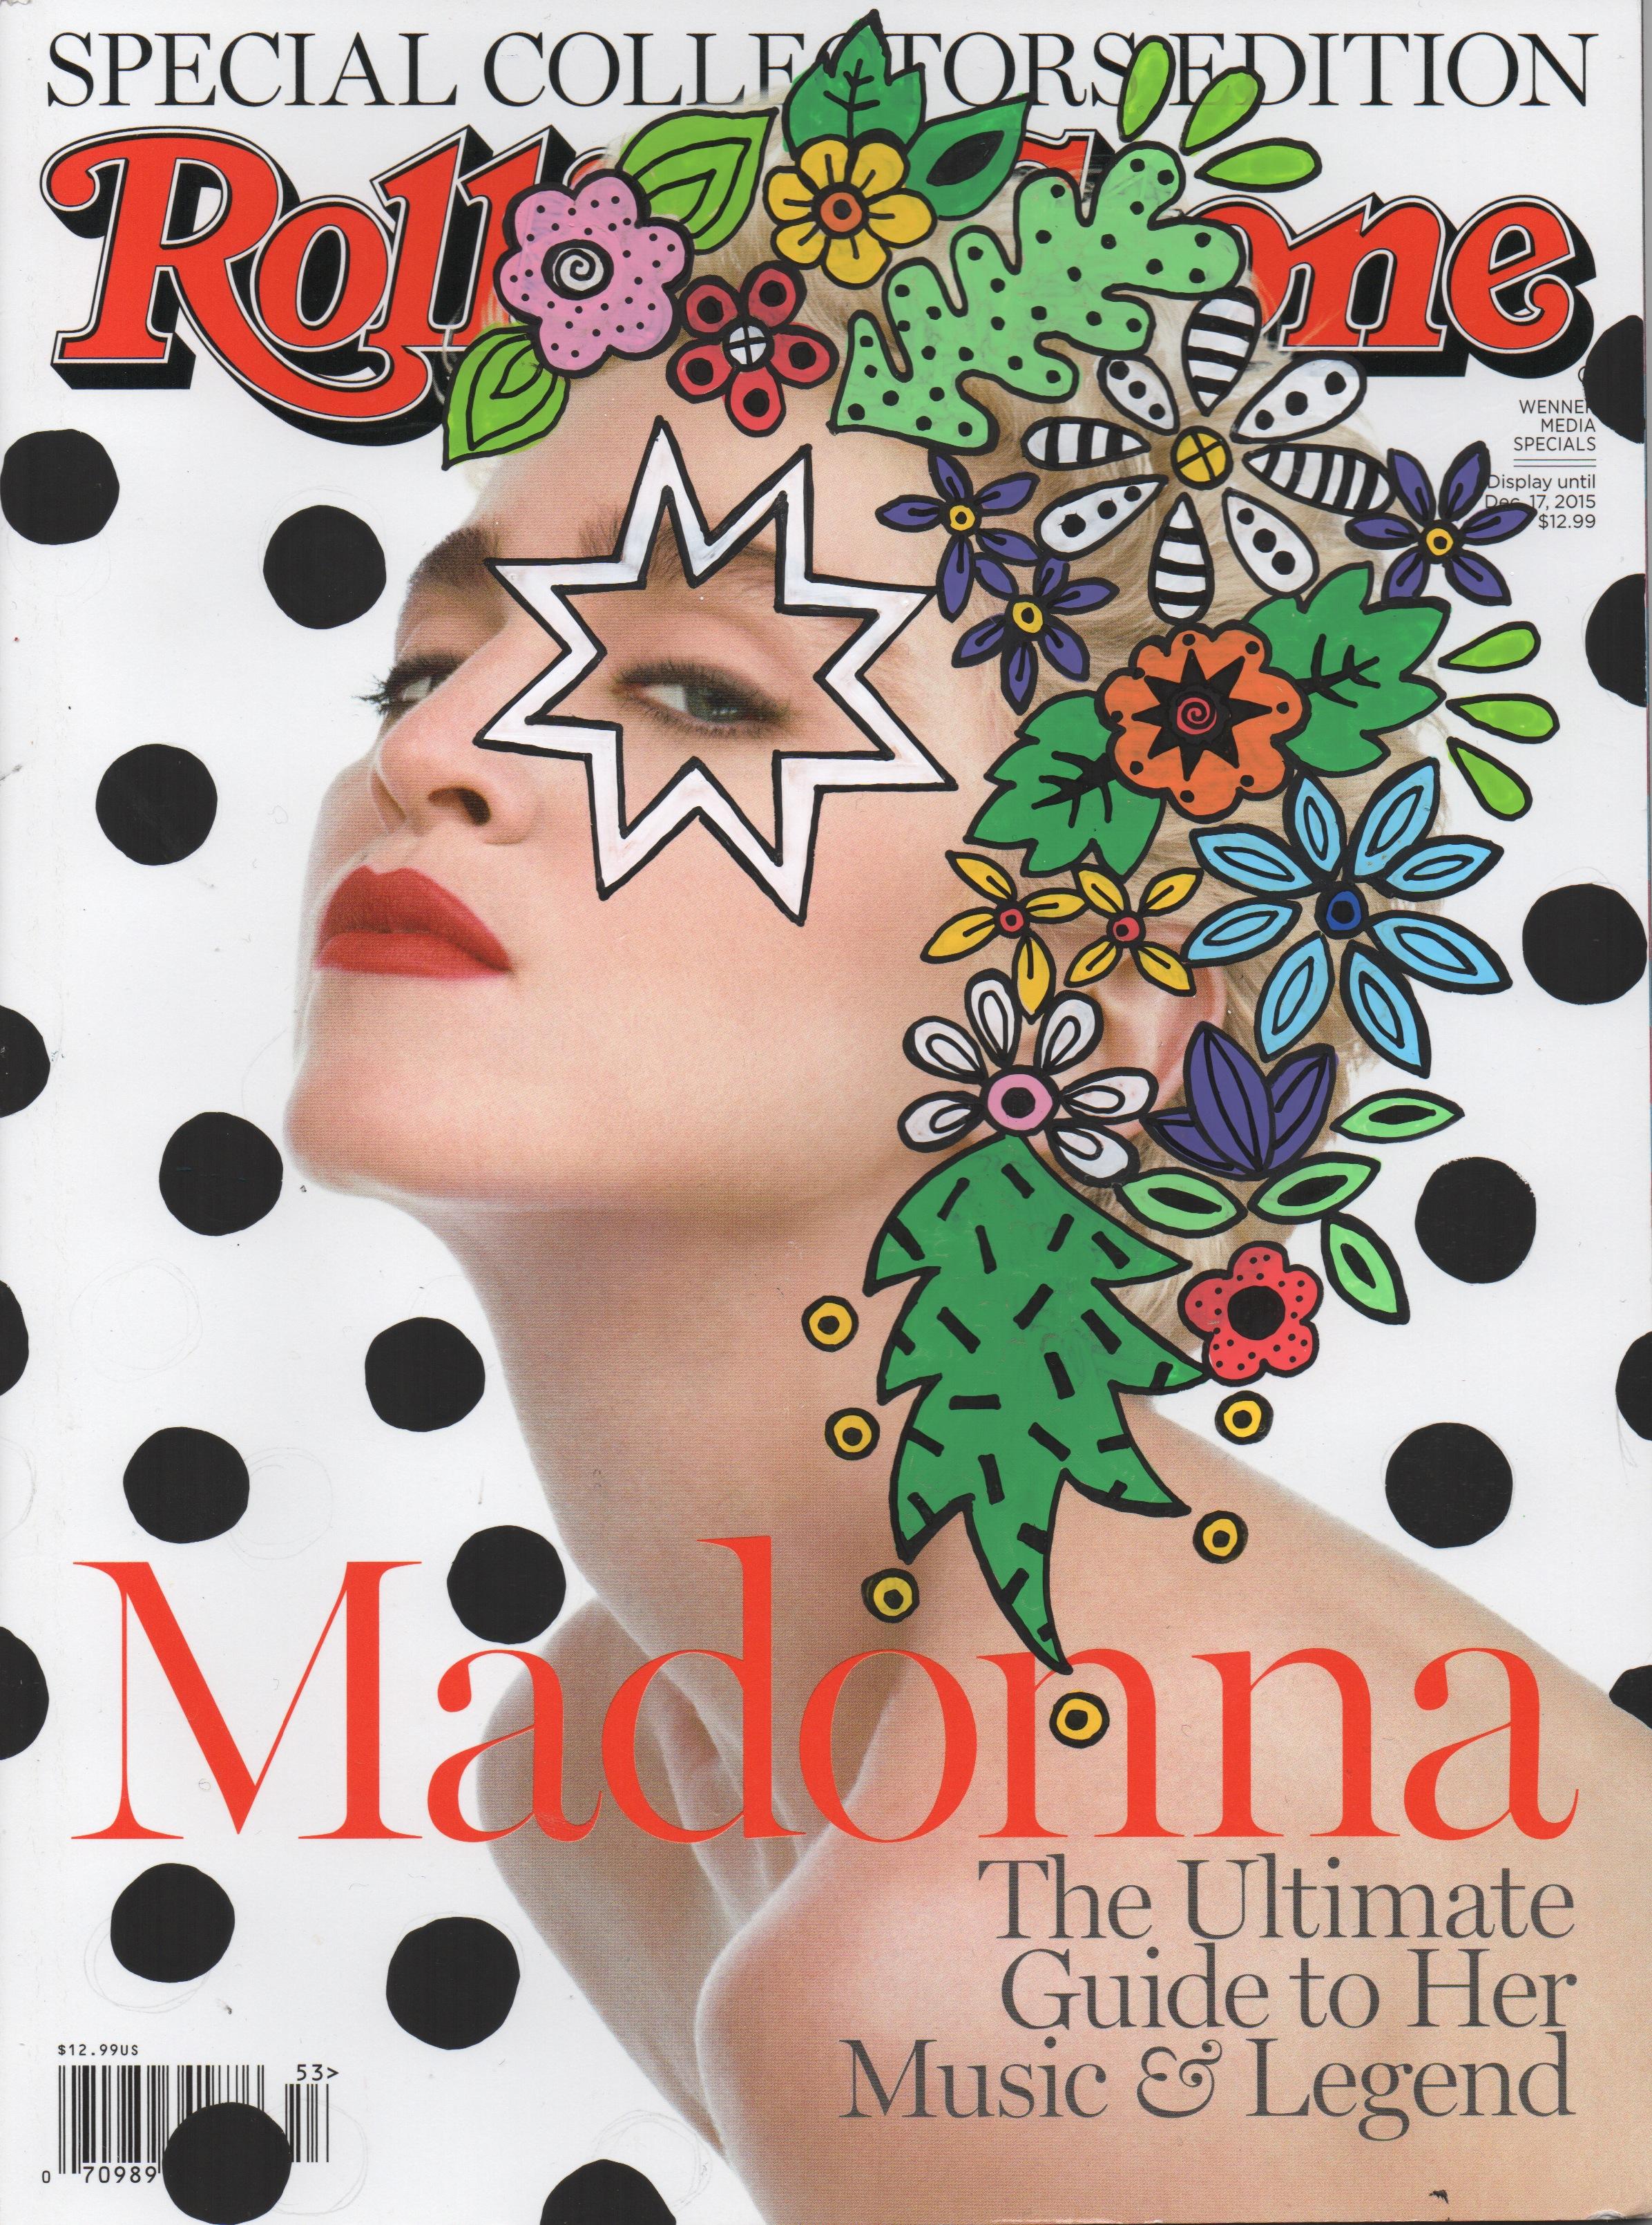 RS - Madonna.jpeg